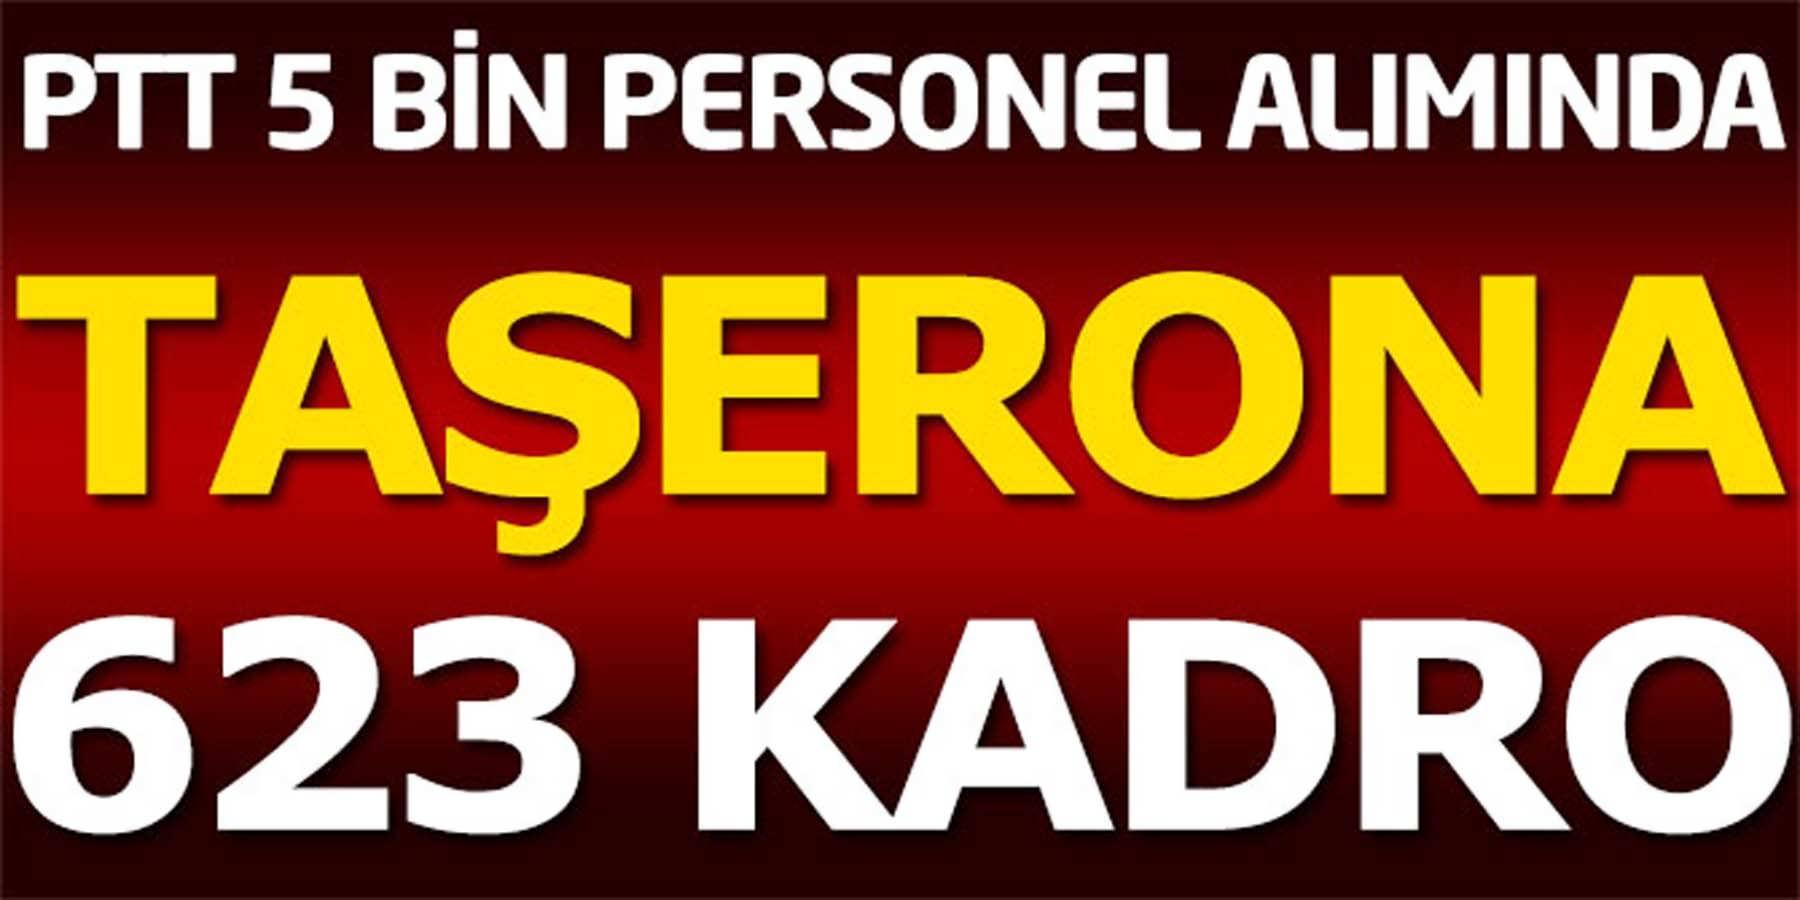 PTT Personel Alımında Taşeronlara 623 Kadro